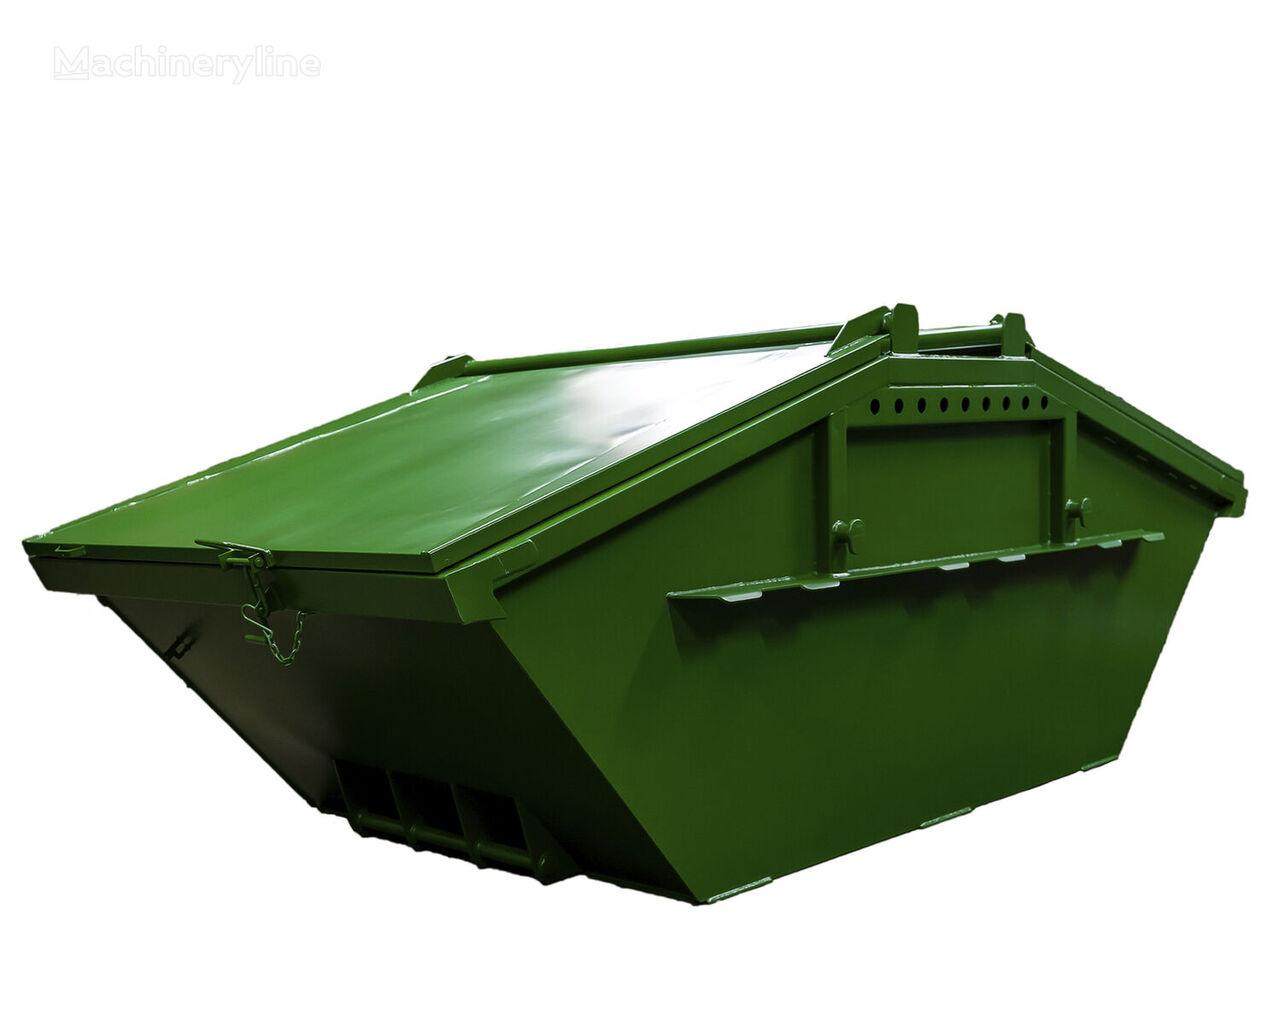 naujas statybinių atliekų konteineris Absetzmulde Absetzcontainer Mulde Container 5cbm Stahldeckel